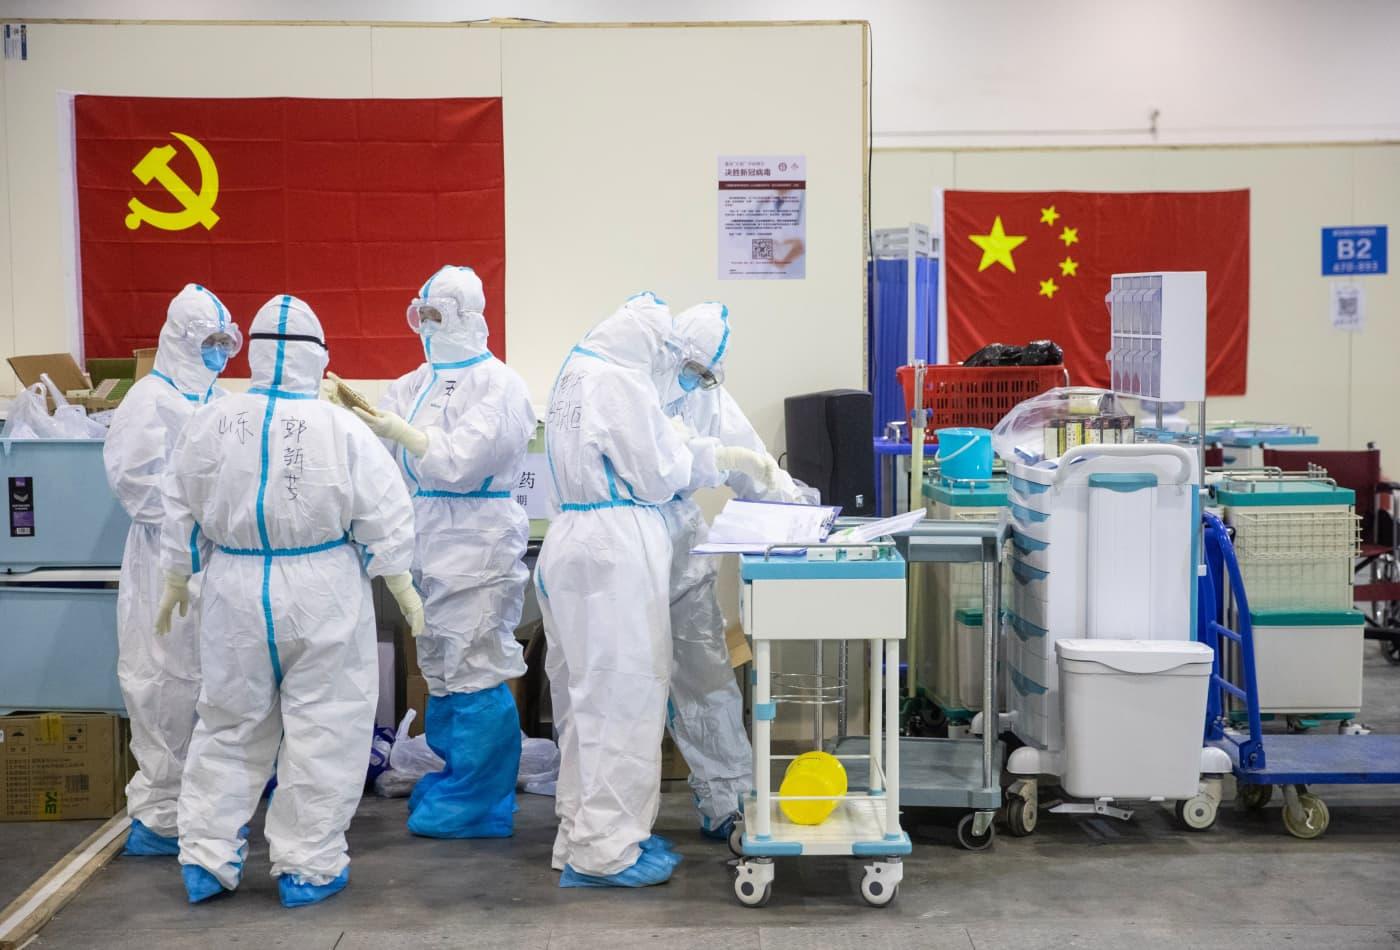 Wuhan hospital director dies from coronavirus, Moody's lowers China forecast